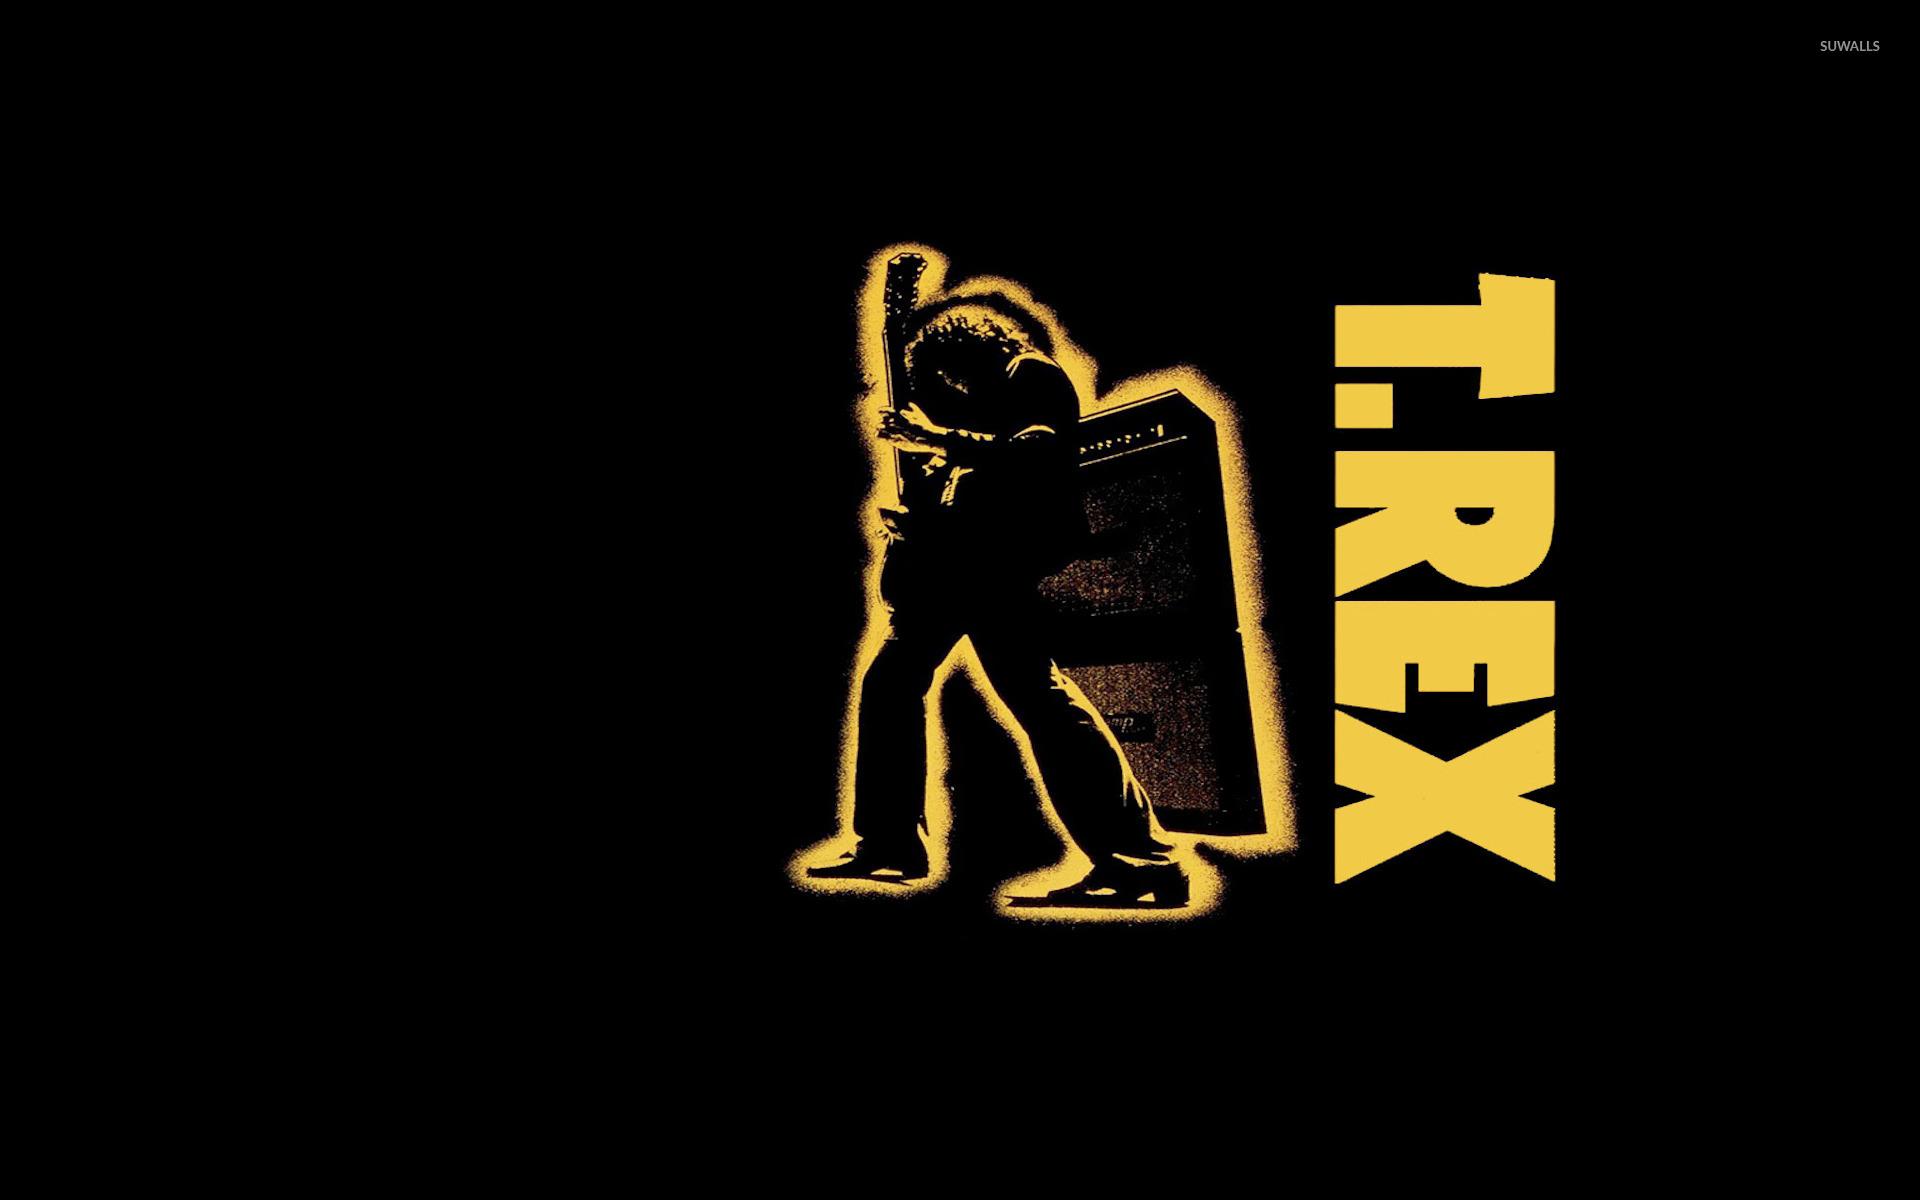 download t rex wallpaper 1680x1050